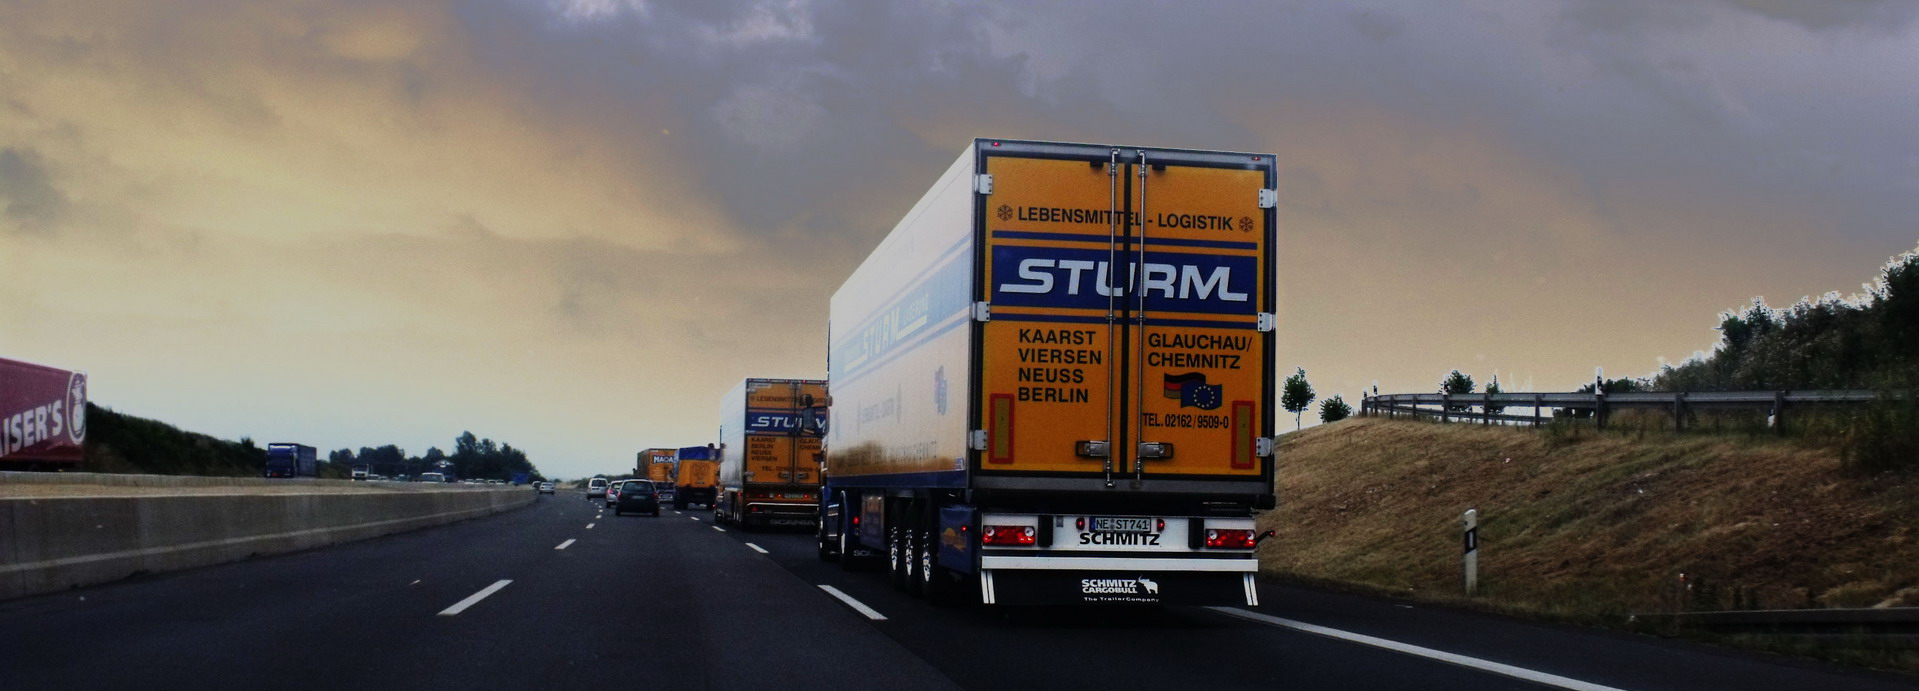 sturm_spedition_3-